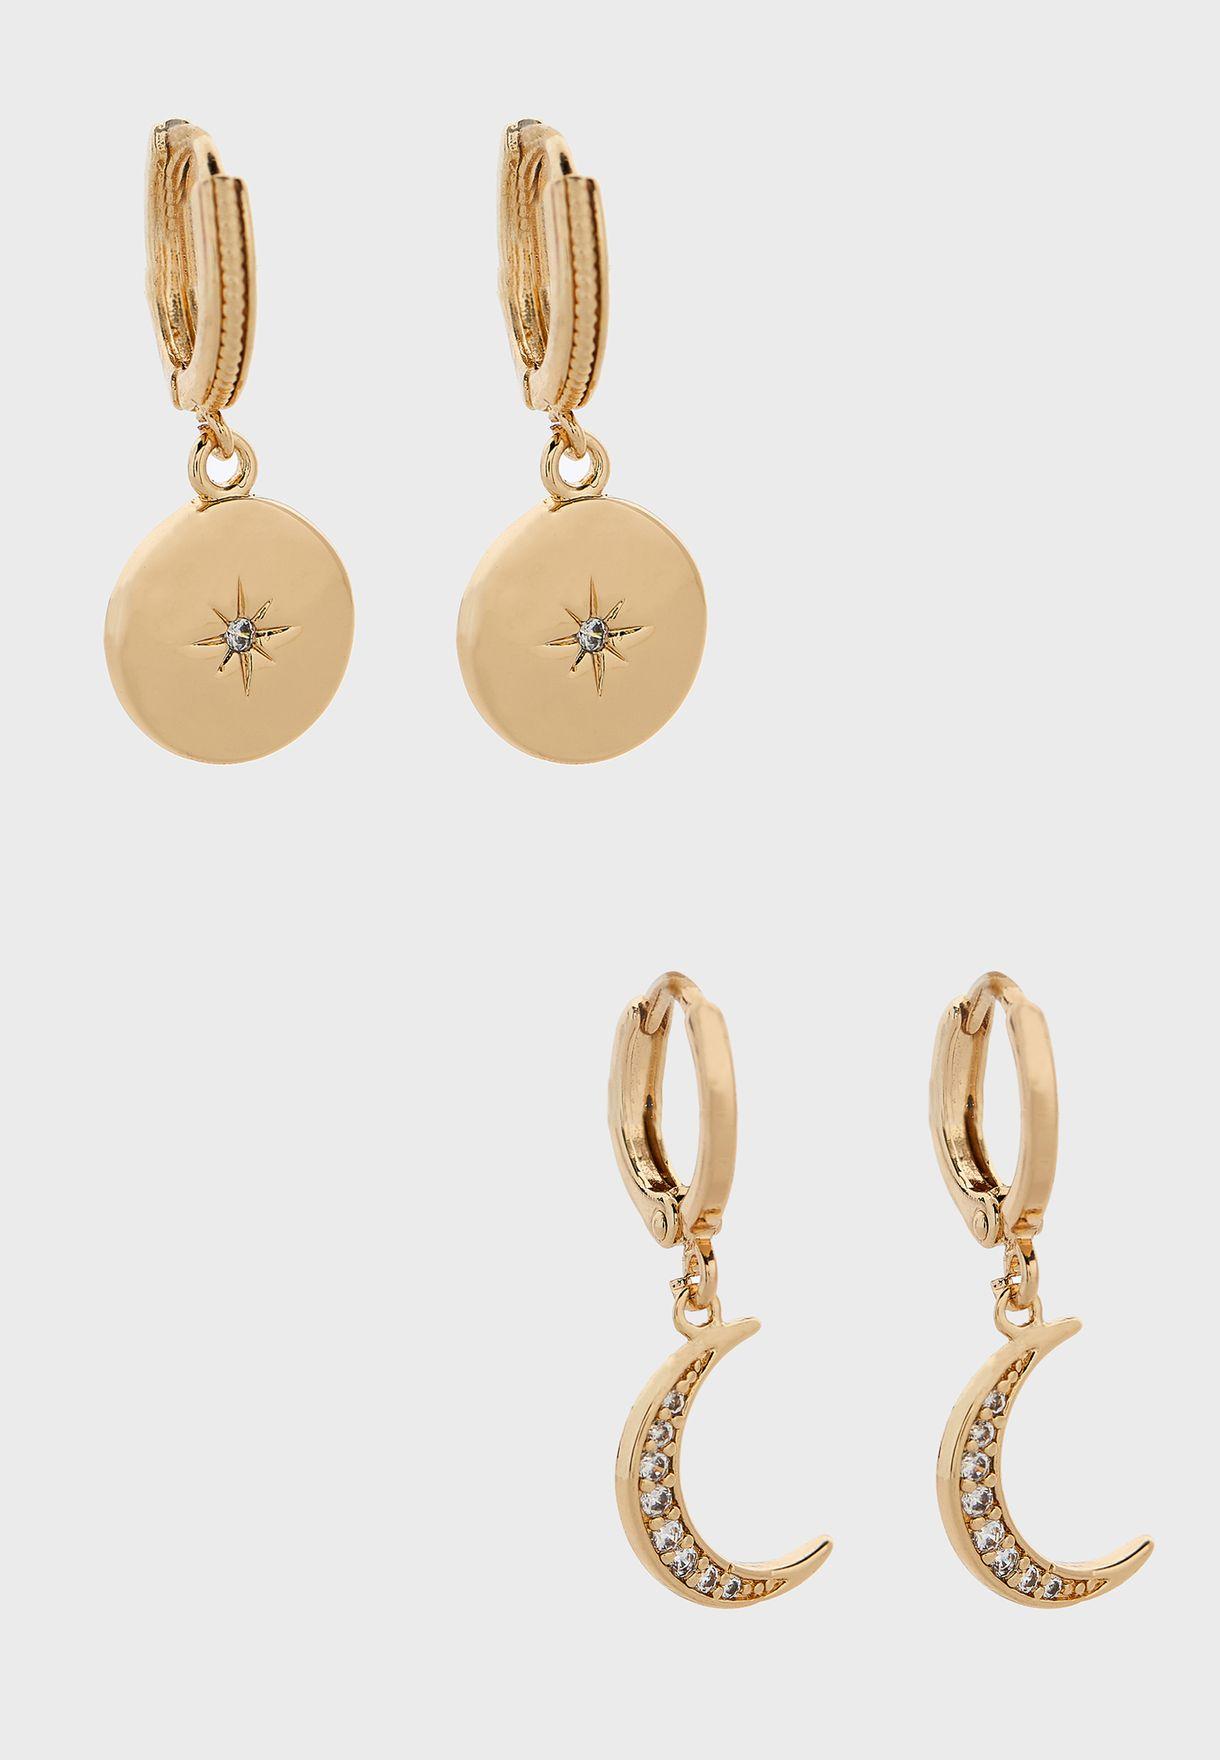 Mini Moon And Star Pendant Earrings Set